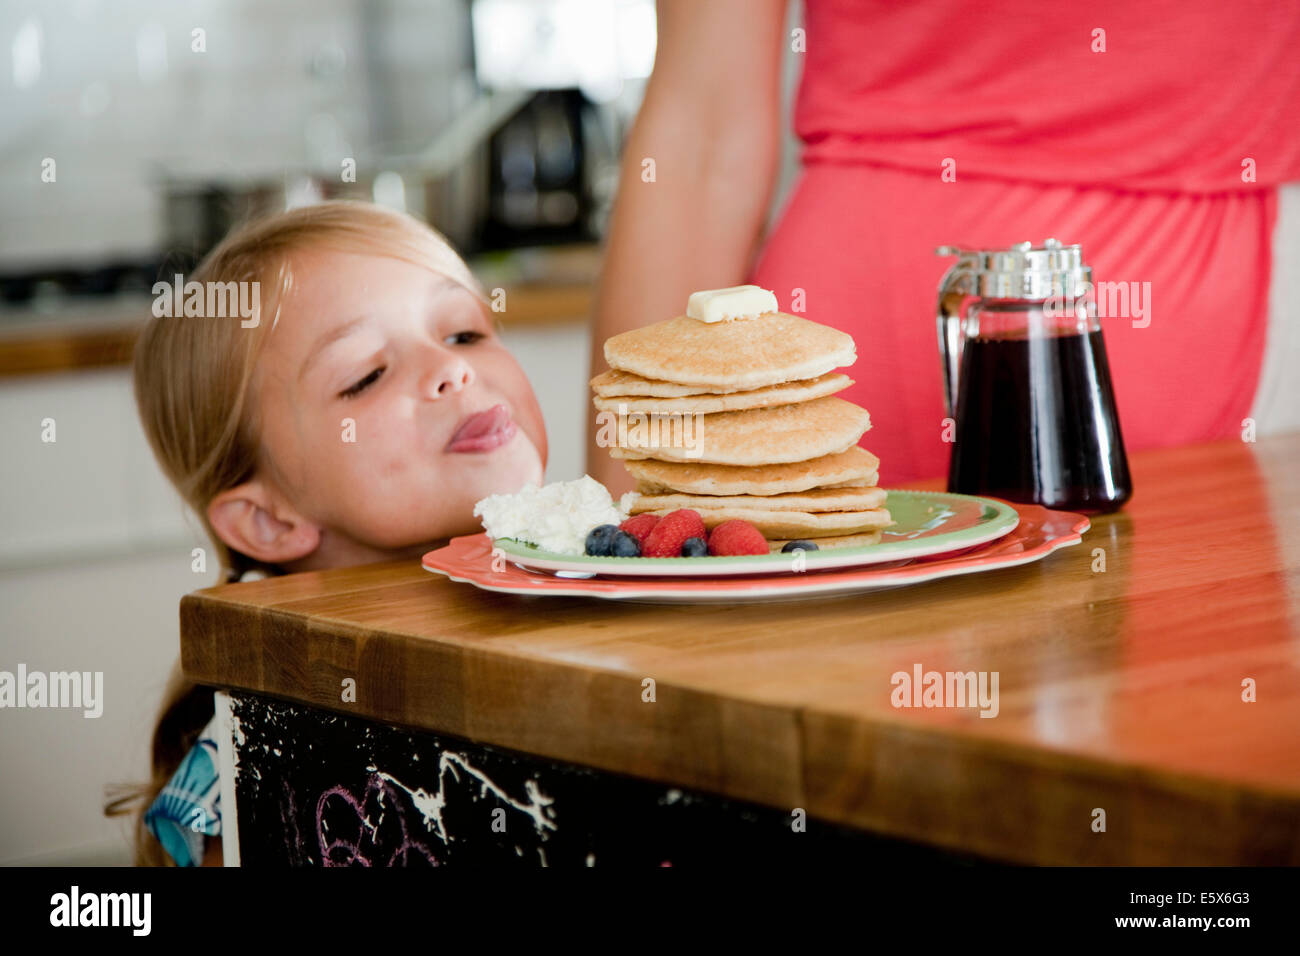 Mischievous girl gazing at pancakes on breakfast bar - Stock Image